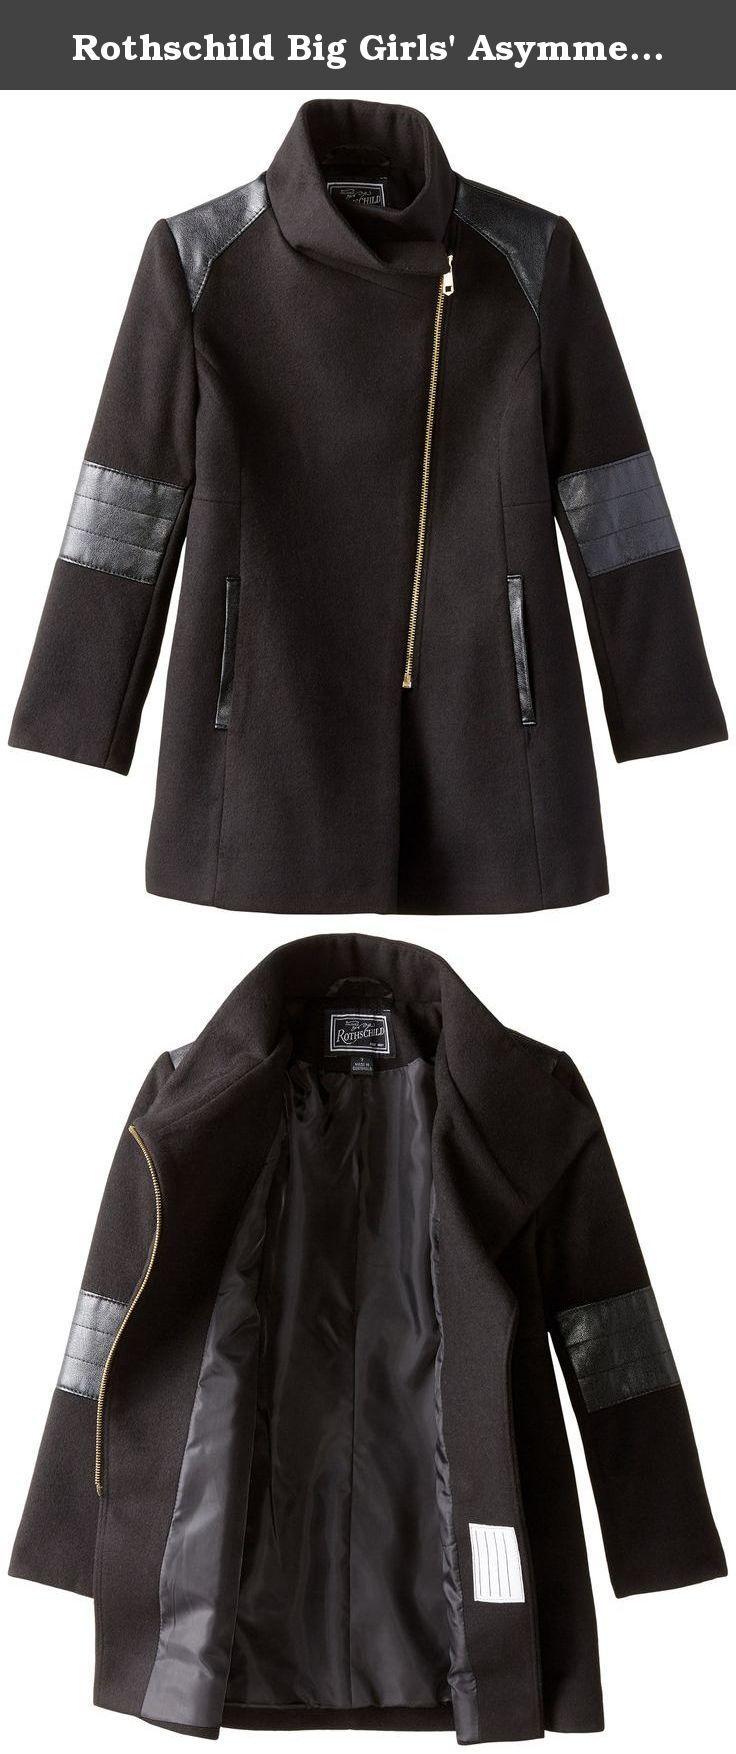 Pin On Dress Coats Jackets Coats Clothing Girls Clothing Shoes Jewelry [ 1754 x 736 Pixel ]